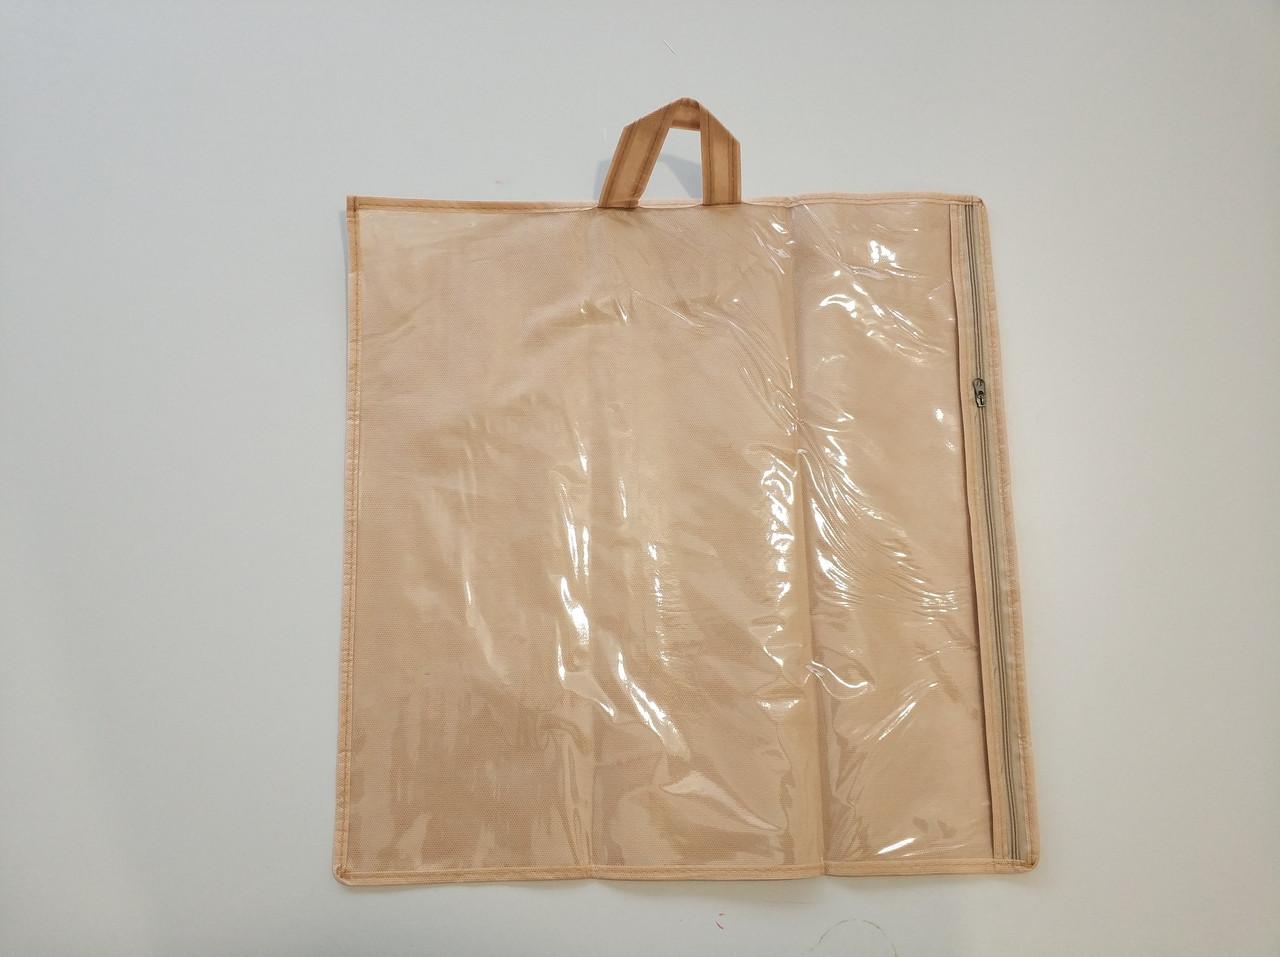 Упаковка для домашнего текстиля 46х46 см